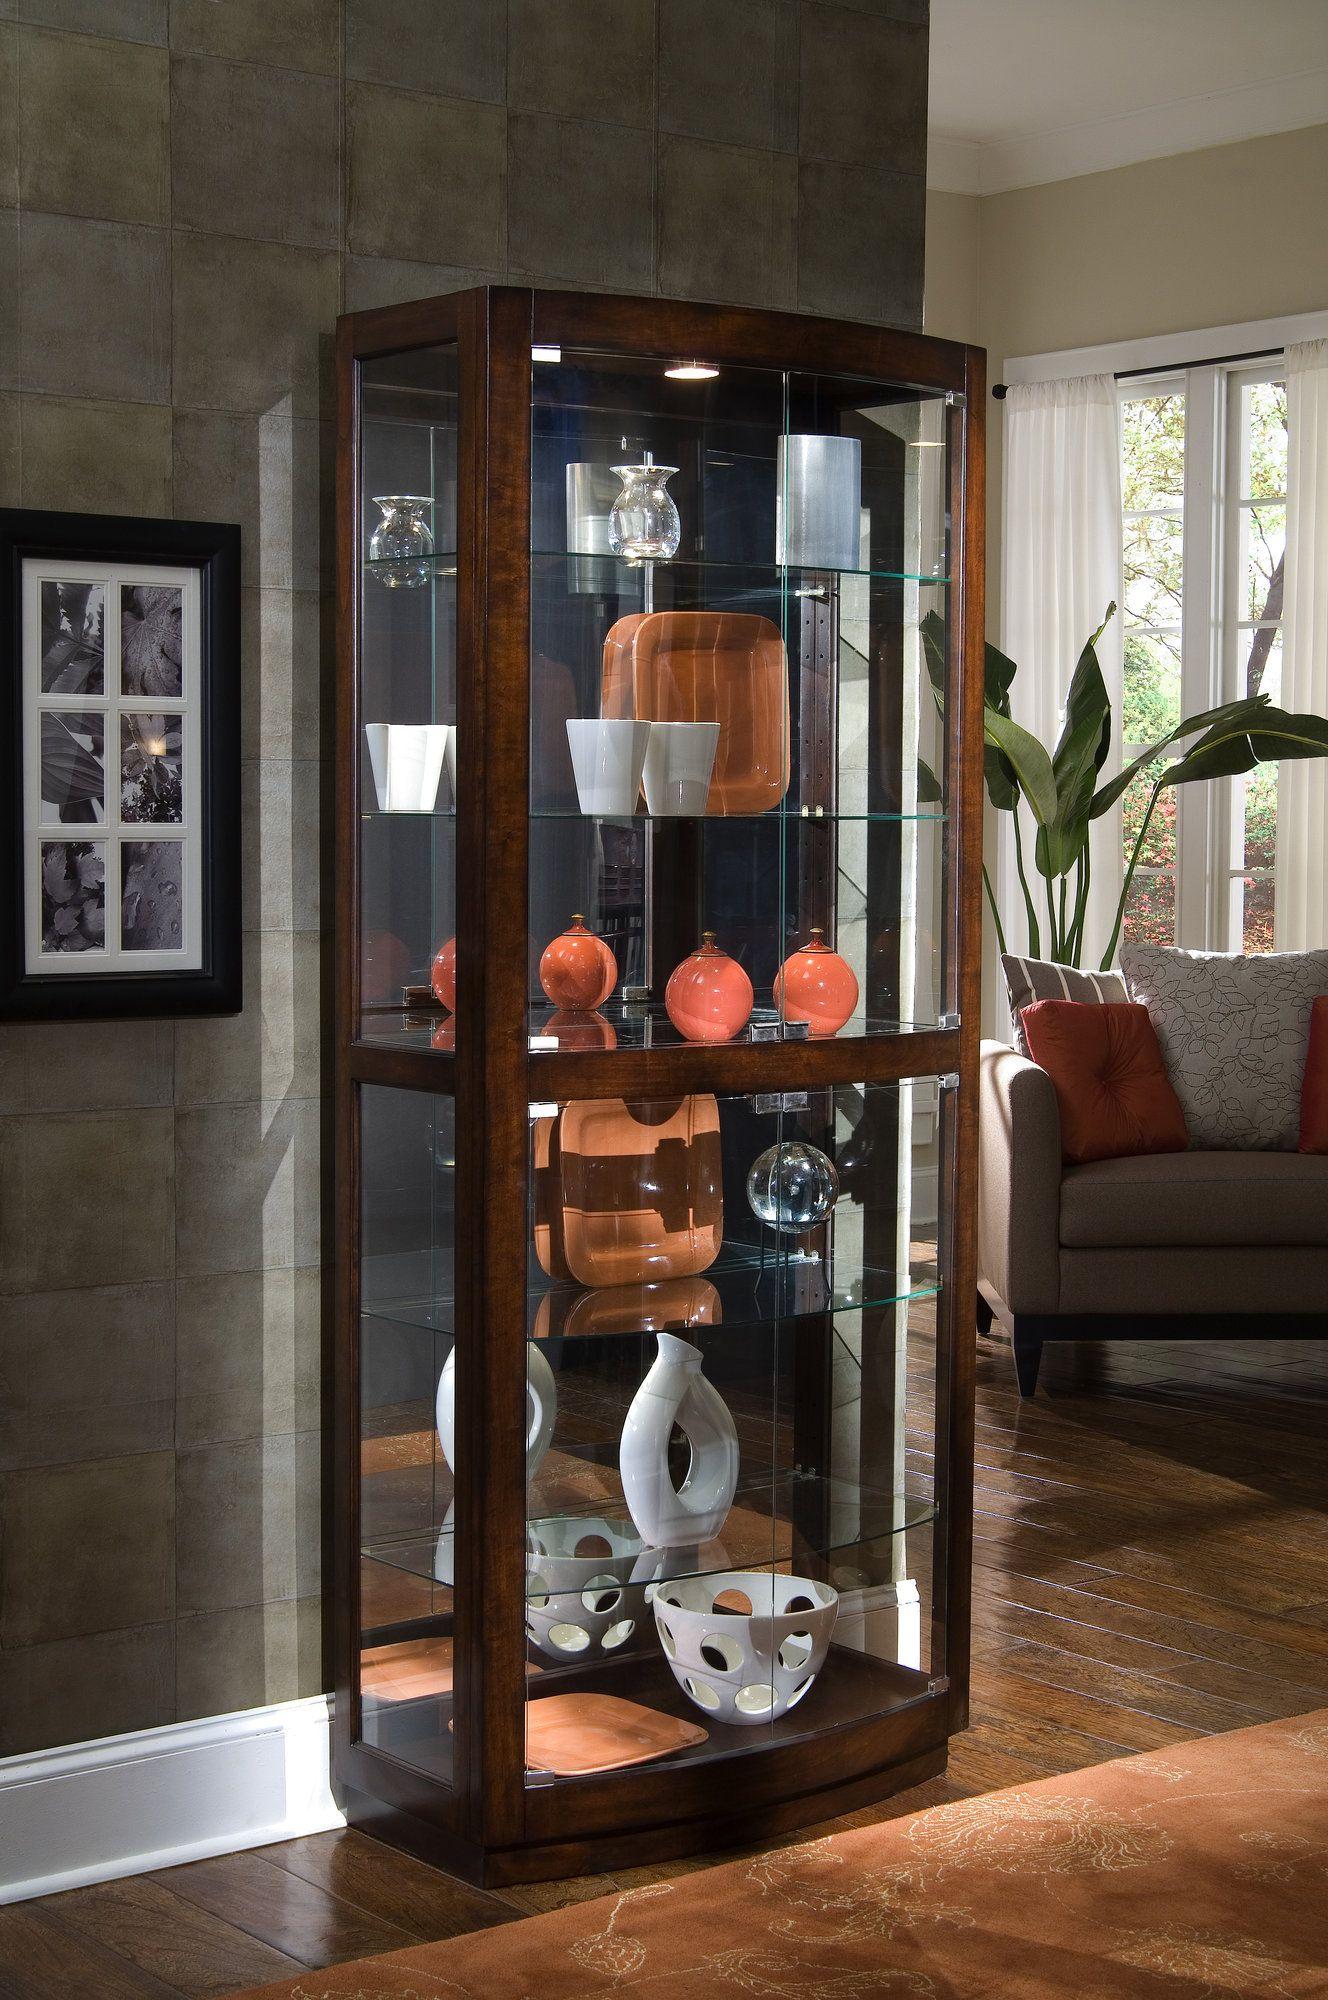 Cheshire Lighted Curio Cabinet | Mueble vitrina, Vitrinas y ...